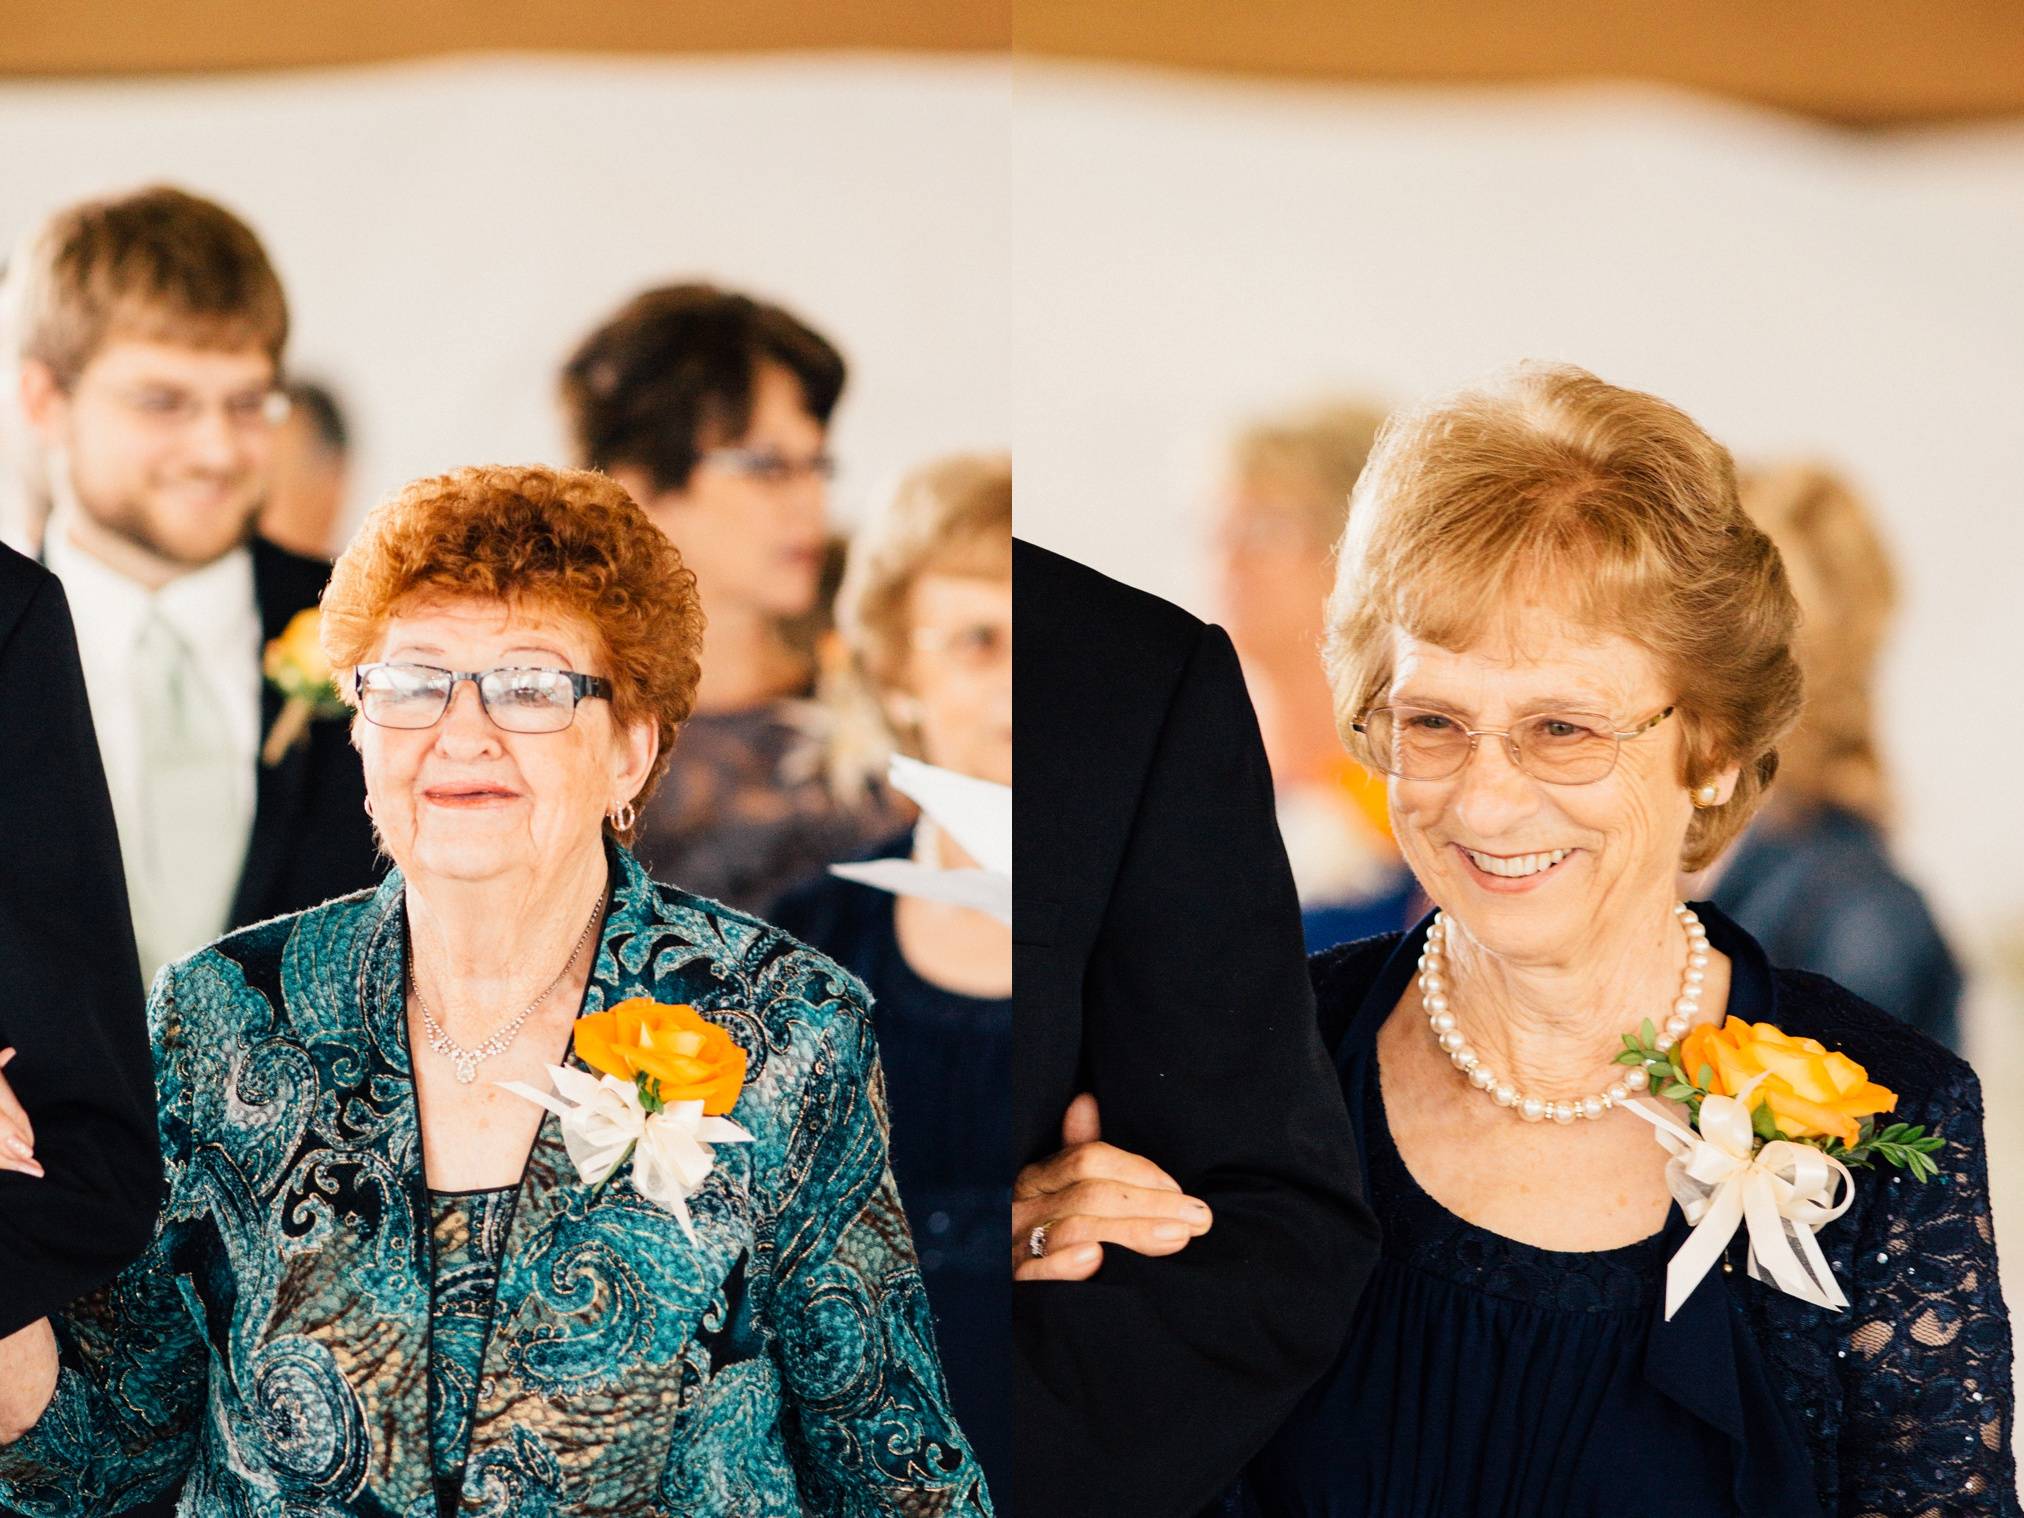 schmid_wedding-289.jpg